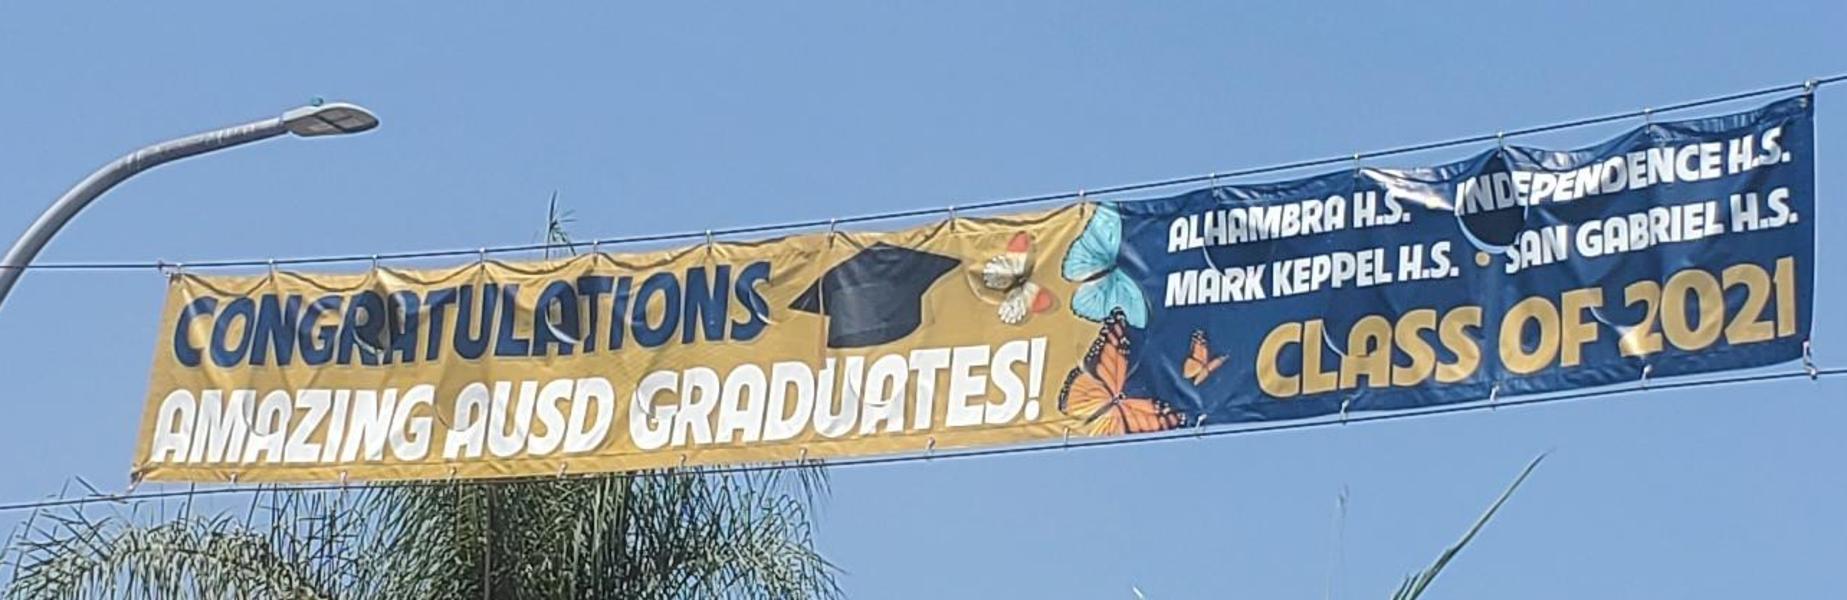 AUSD 2021 Graduates Banner